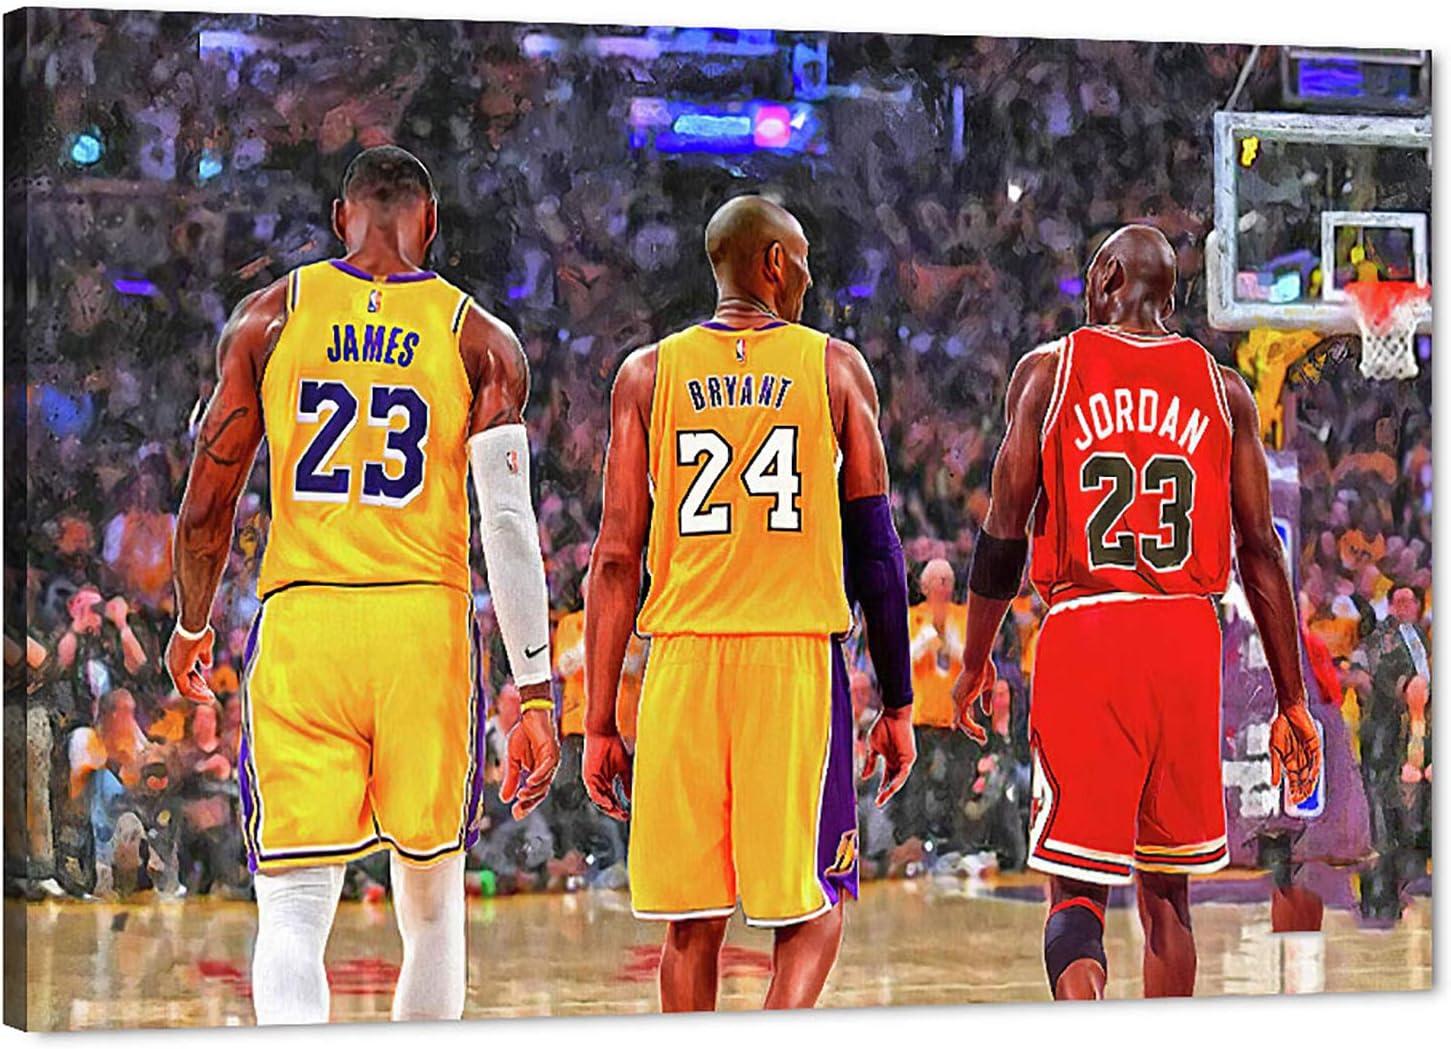 "MJ Jordan Kobe Bryant Lebron James Canvas Wall Art, Legend Basketball Star Michael Kobe Lebron Canvas Print Artwork for Room Decor, Home Bedroom Wall Decor, Men Boys Gift Framed Artwork (12"" Wx18 H)"